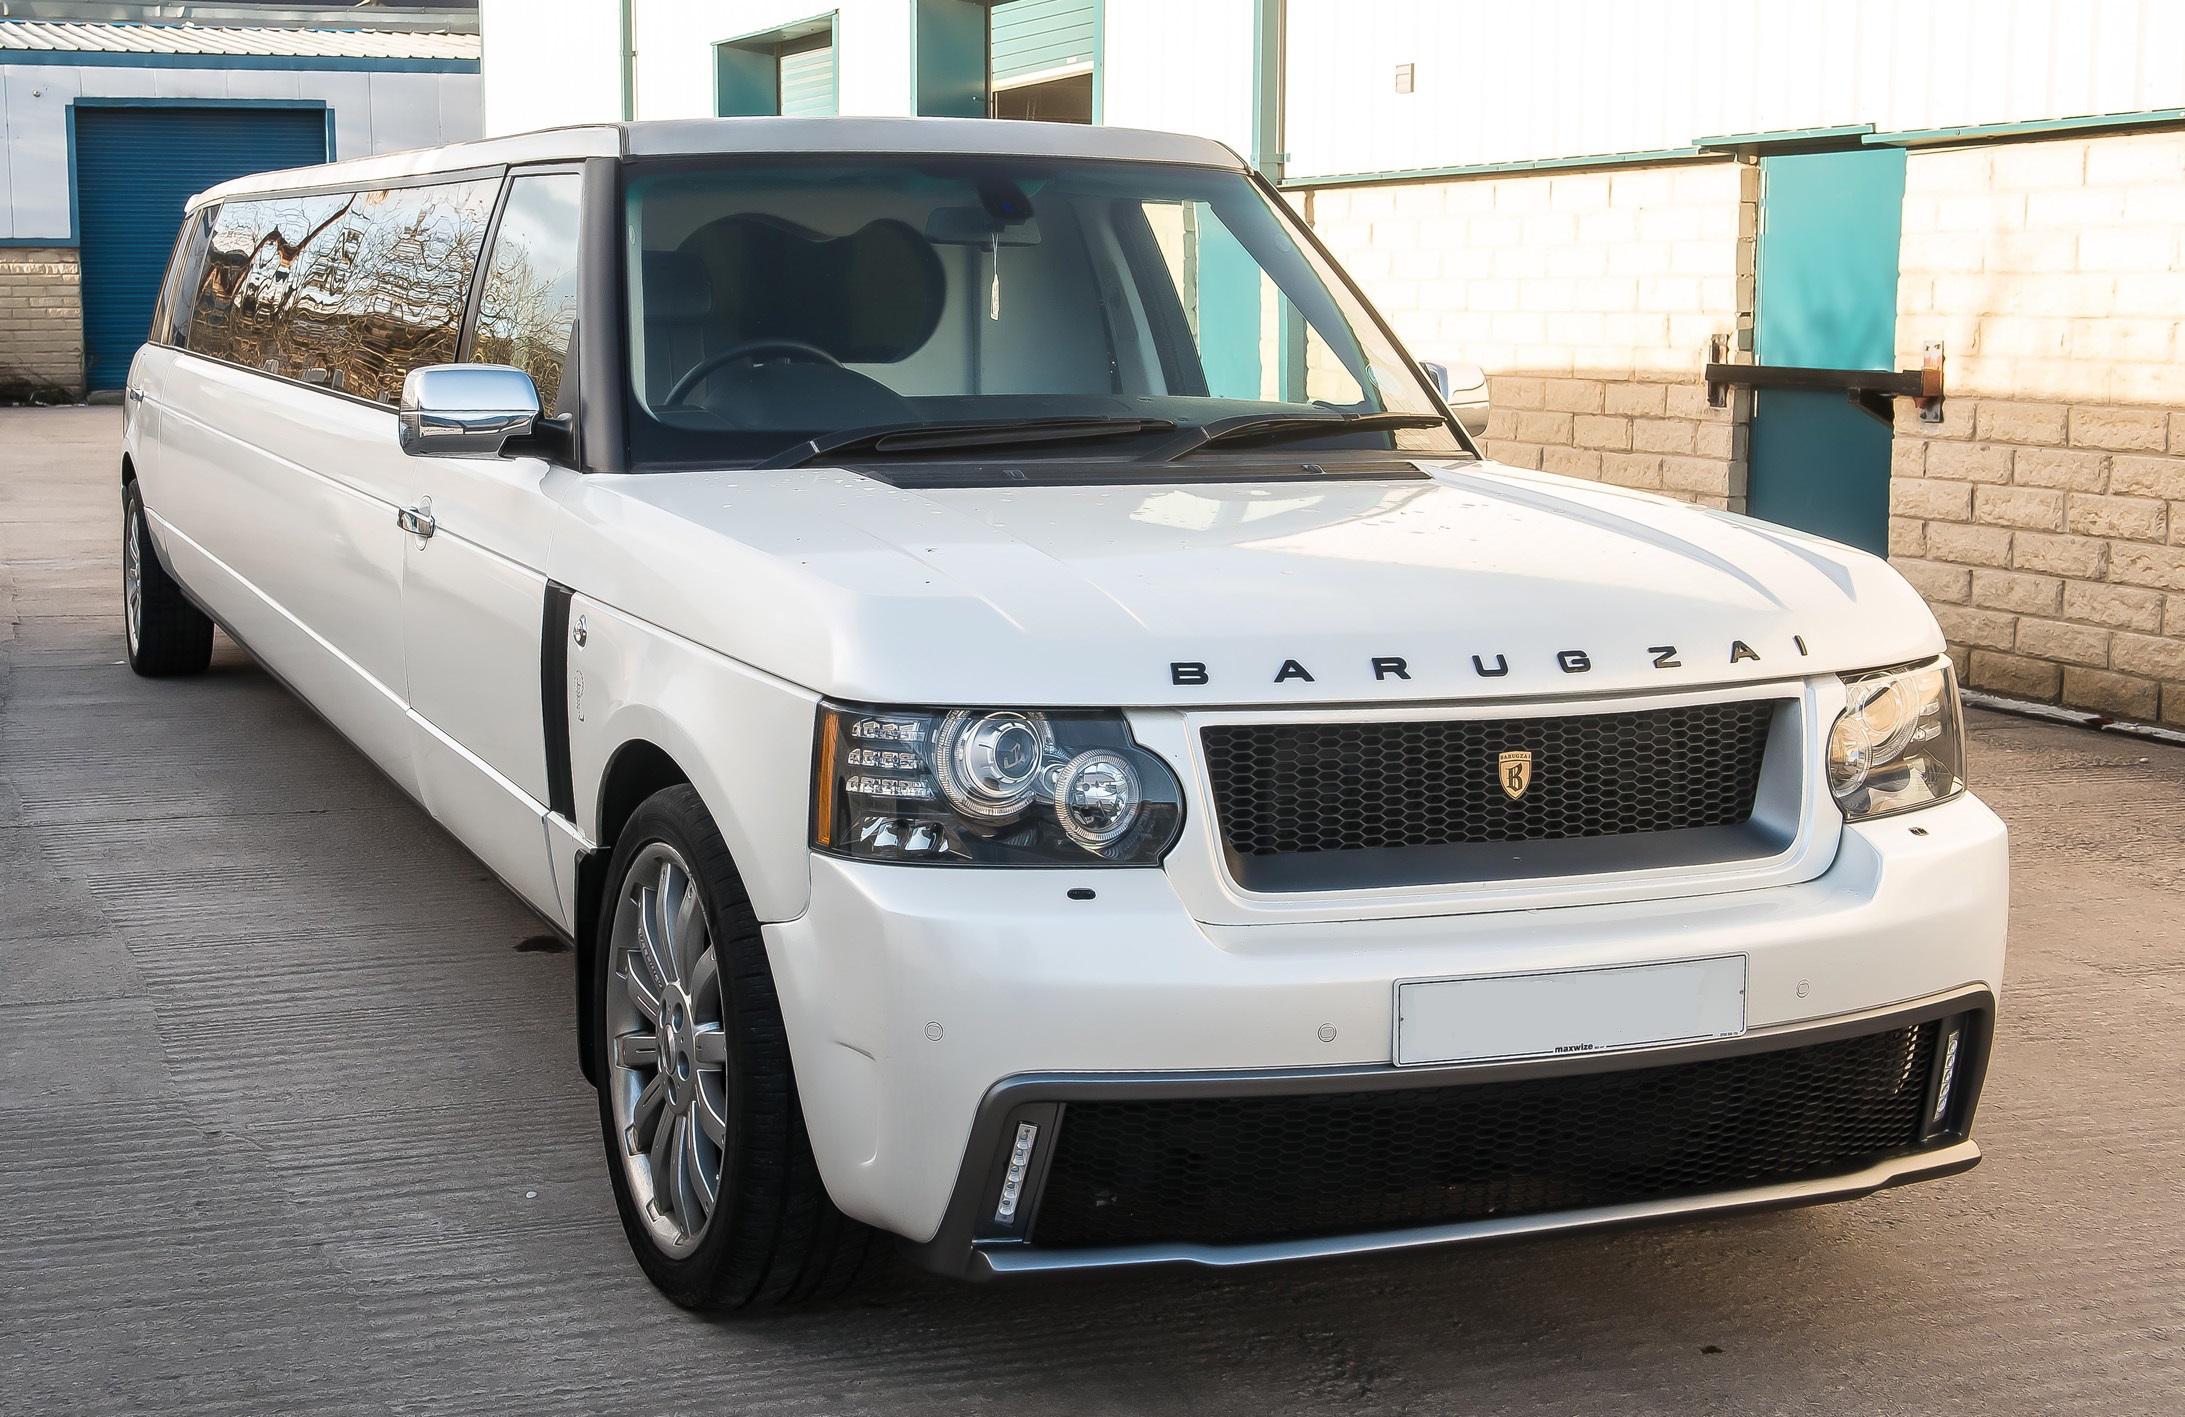 Range Rover Limo Hire